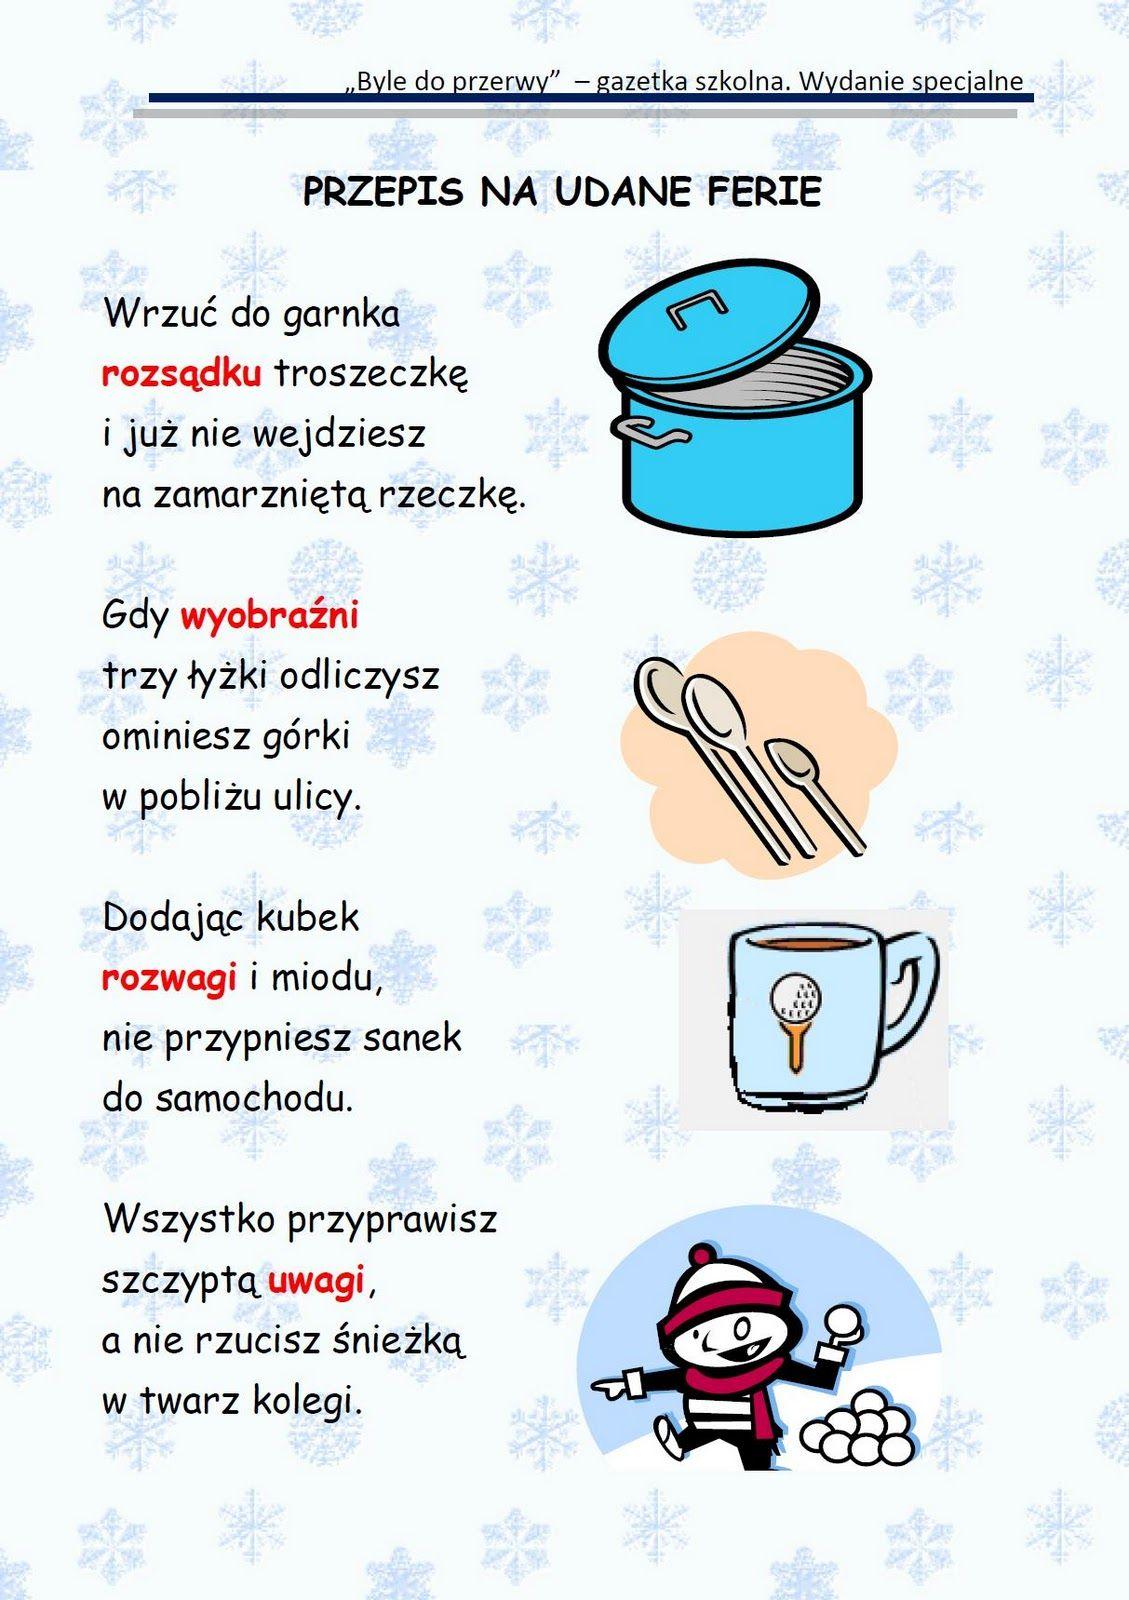 2 Jpg 1129 1600 School Songs Polish Language Primary Teaching